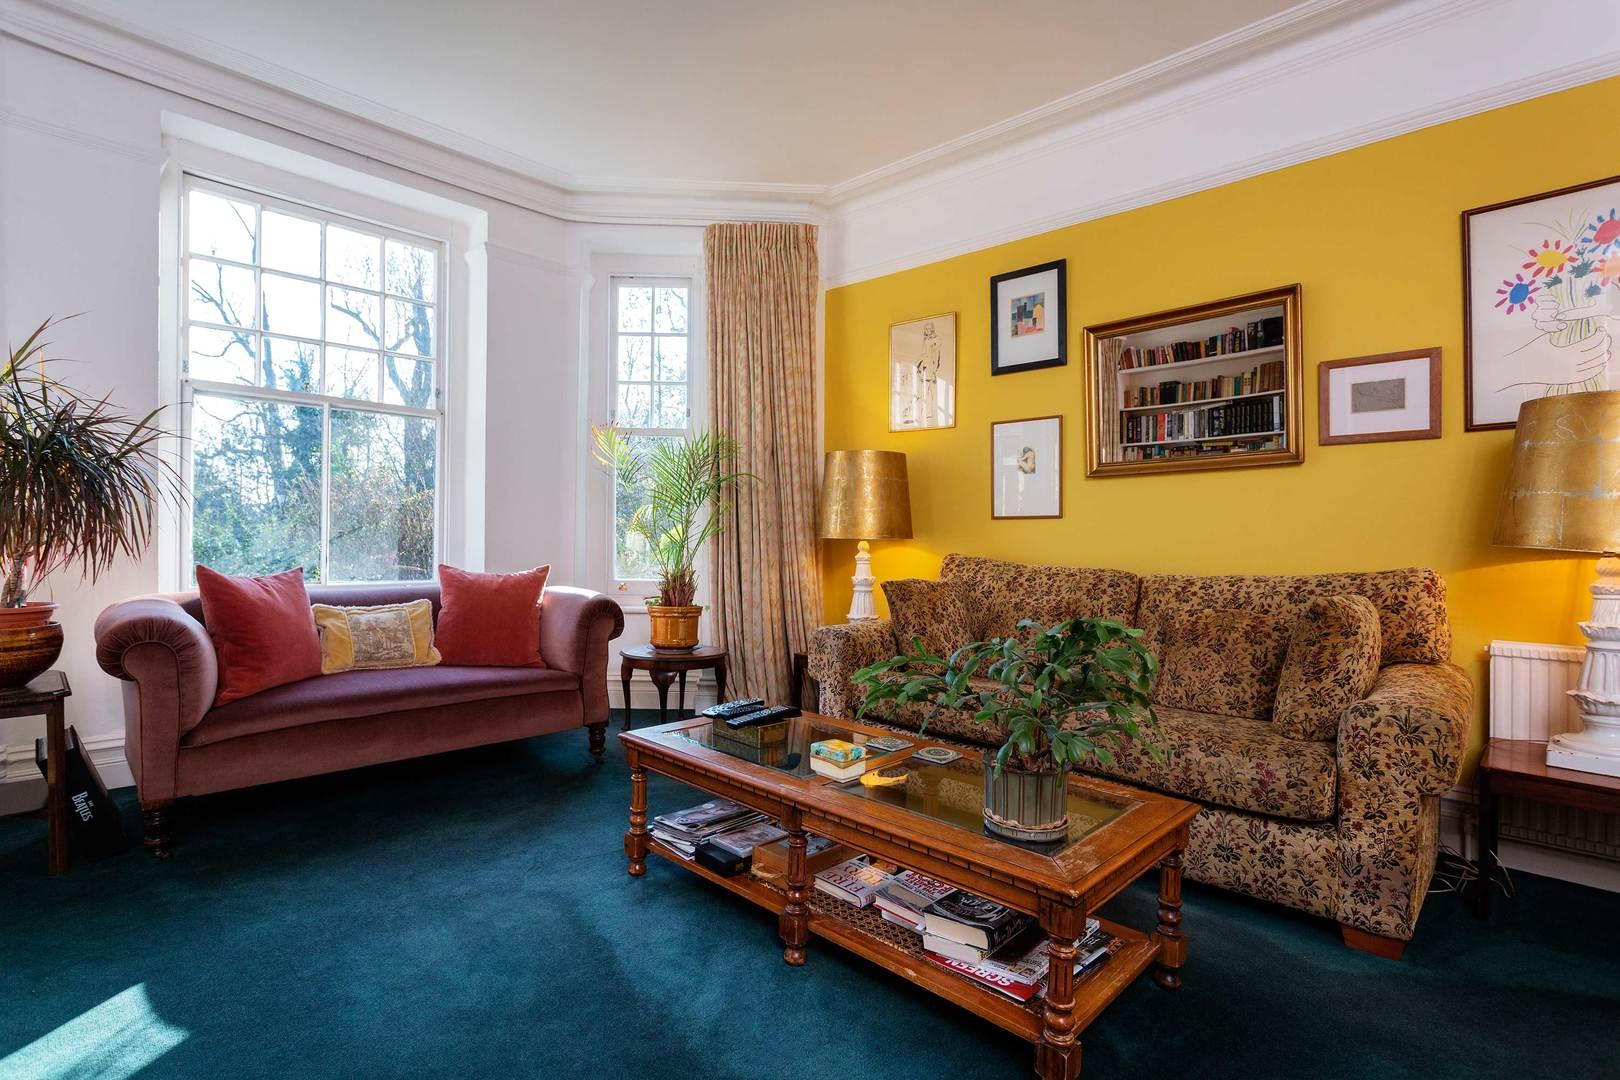 brookfield mansions 2 bed apartment in hampstead u2022 veeve rh veeve com